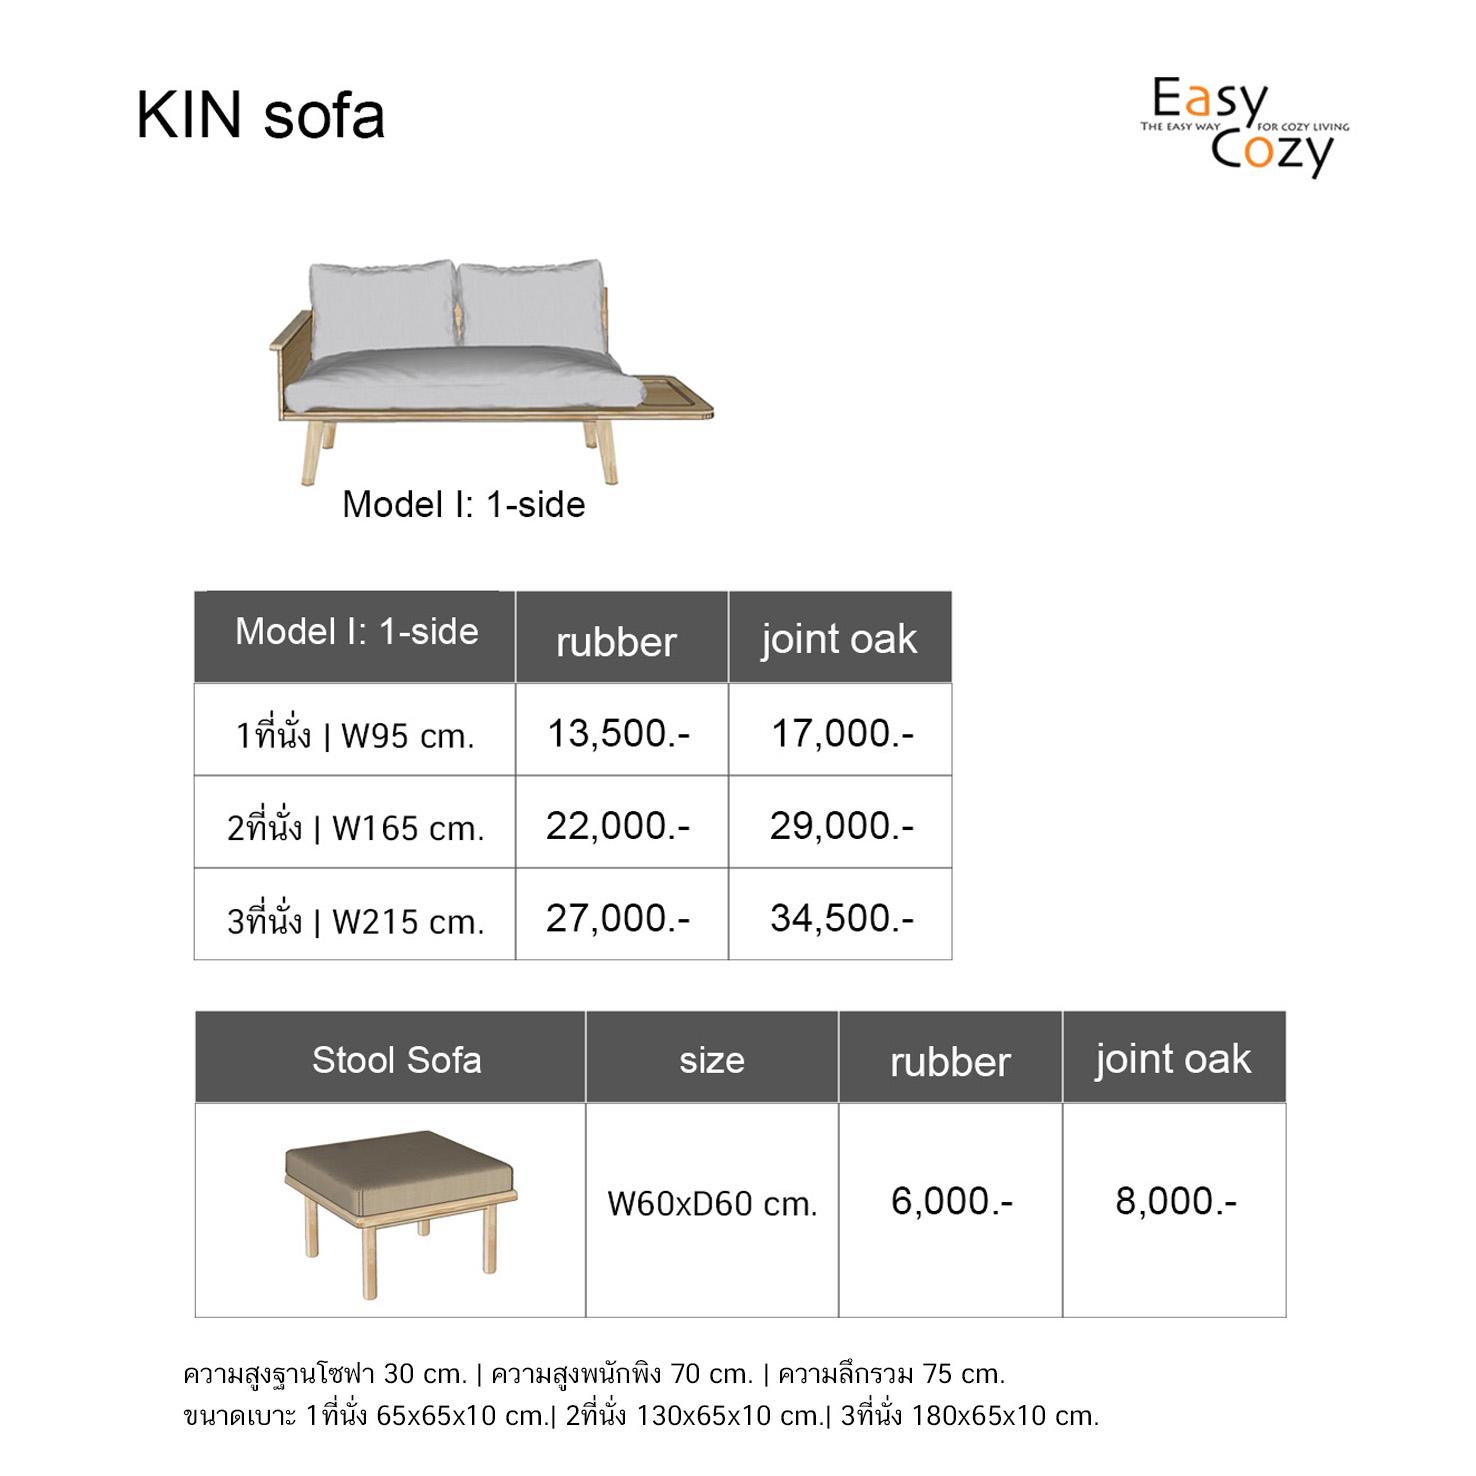 Kin sofa 1side- website